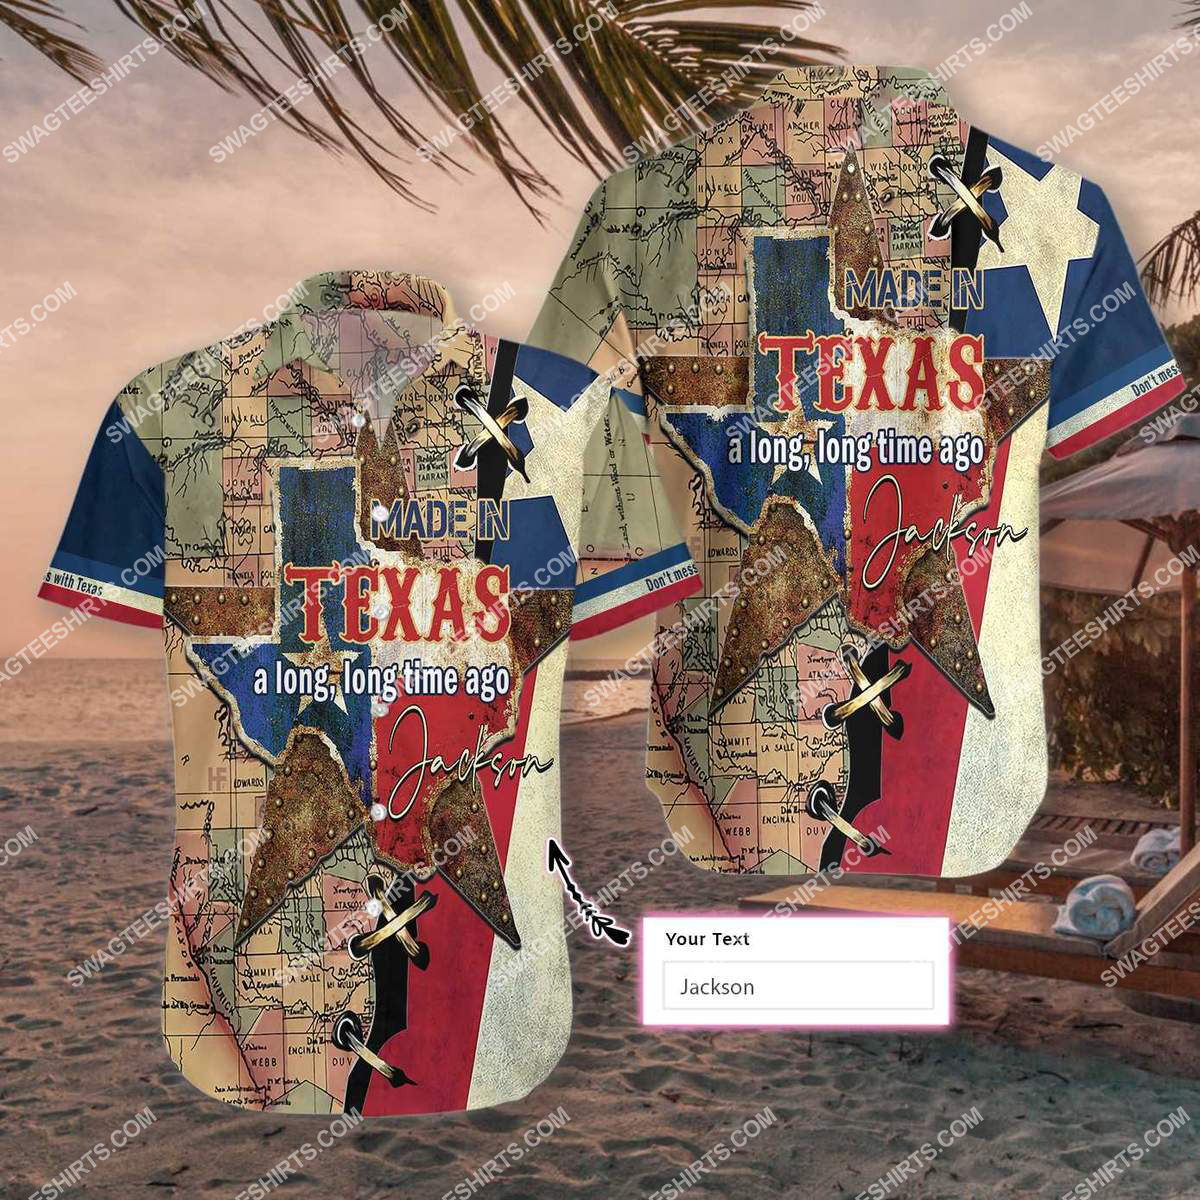 custom name made in texas a long long time ago all over printed hawaiian shirt 2(1)